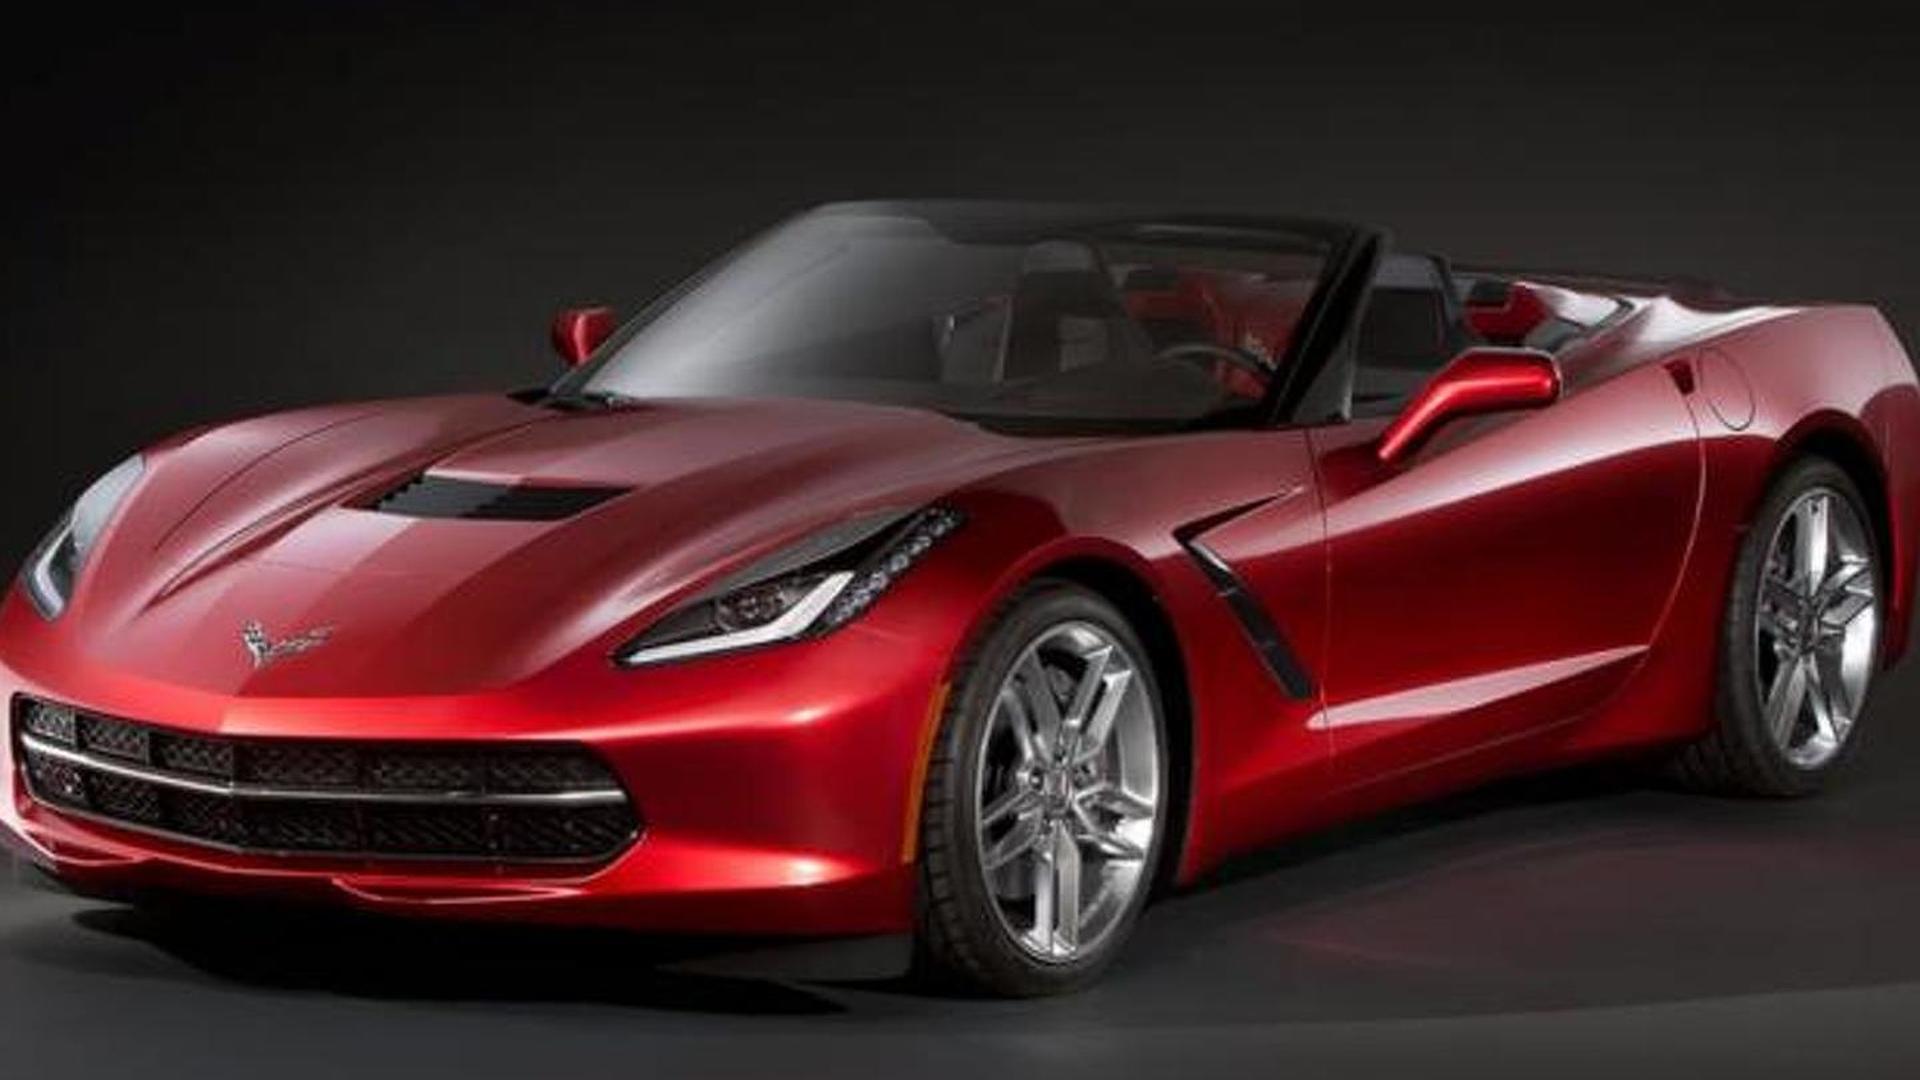 Chevrolet Corvette Stingray Convertible Already Leaked